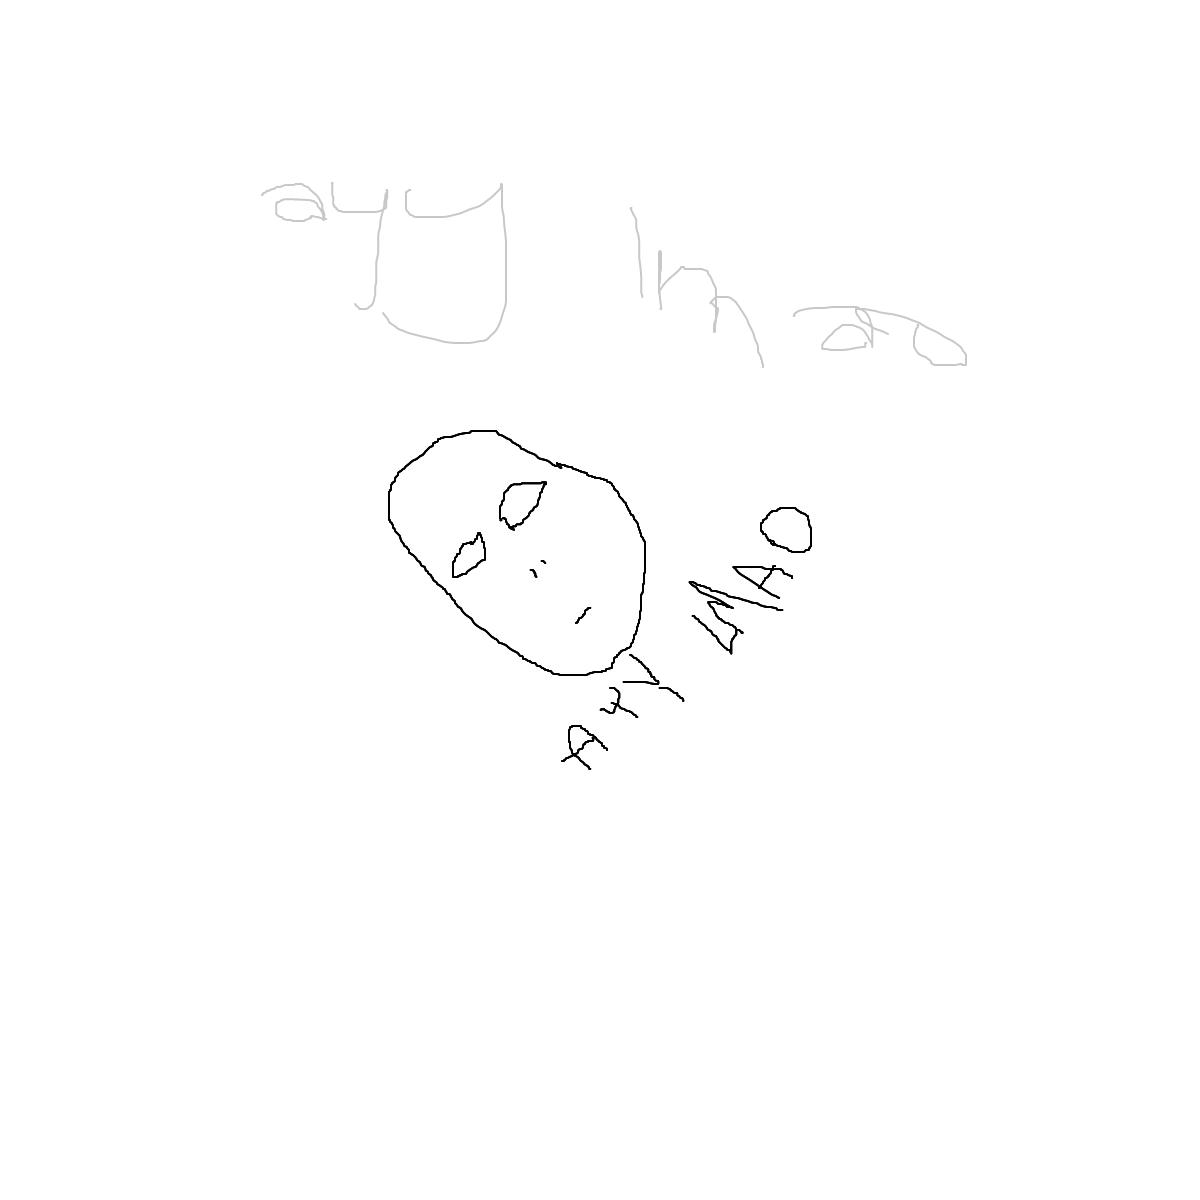 BAAAM drawing#6603 lat:39.0187530517578100lng: 125.7693786621093800